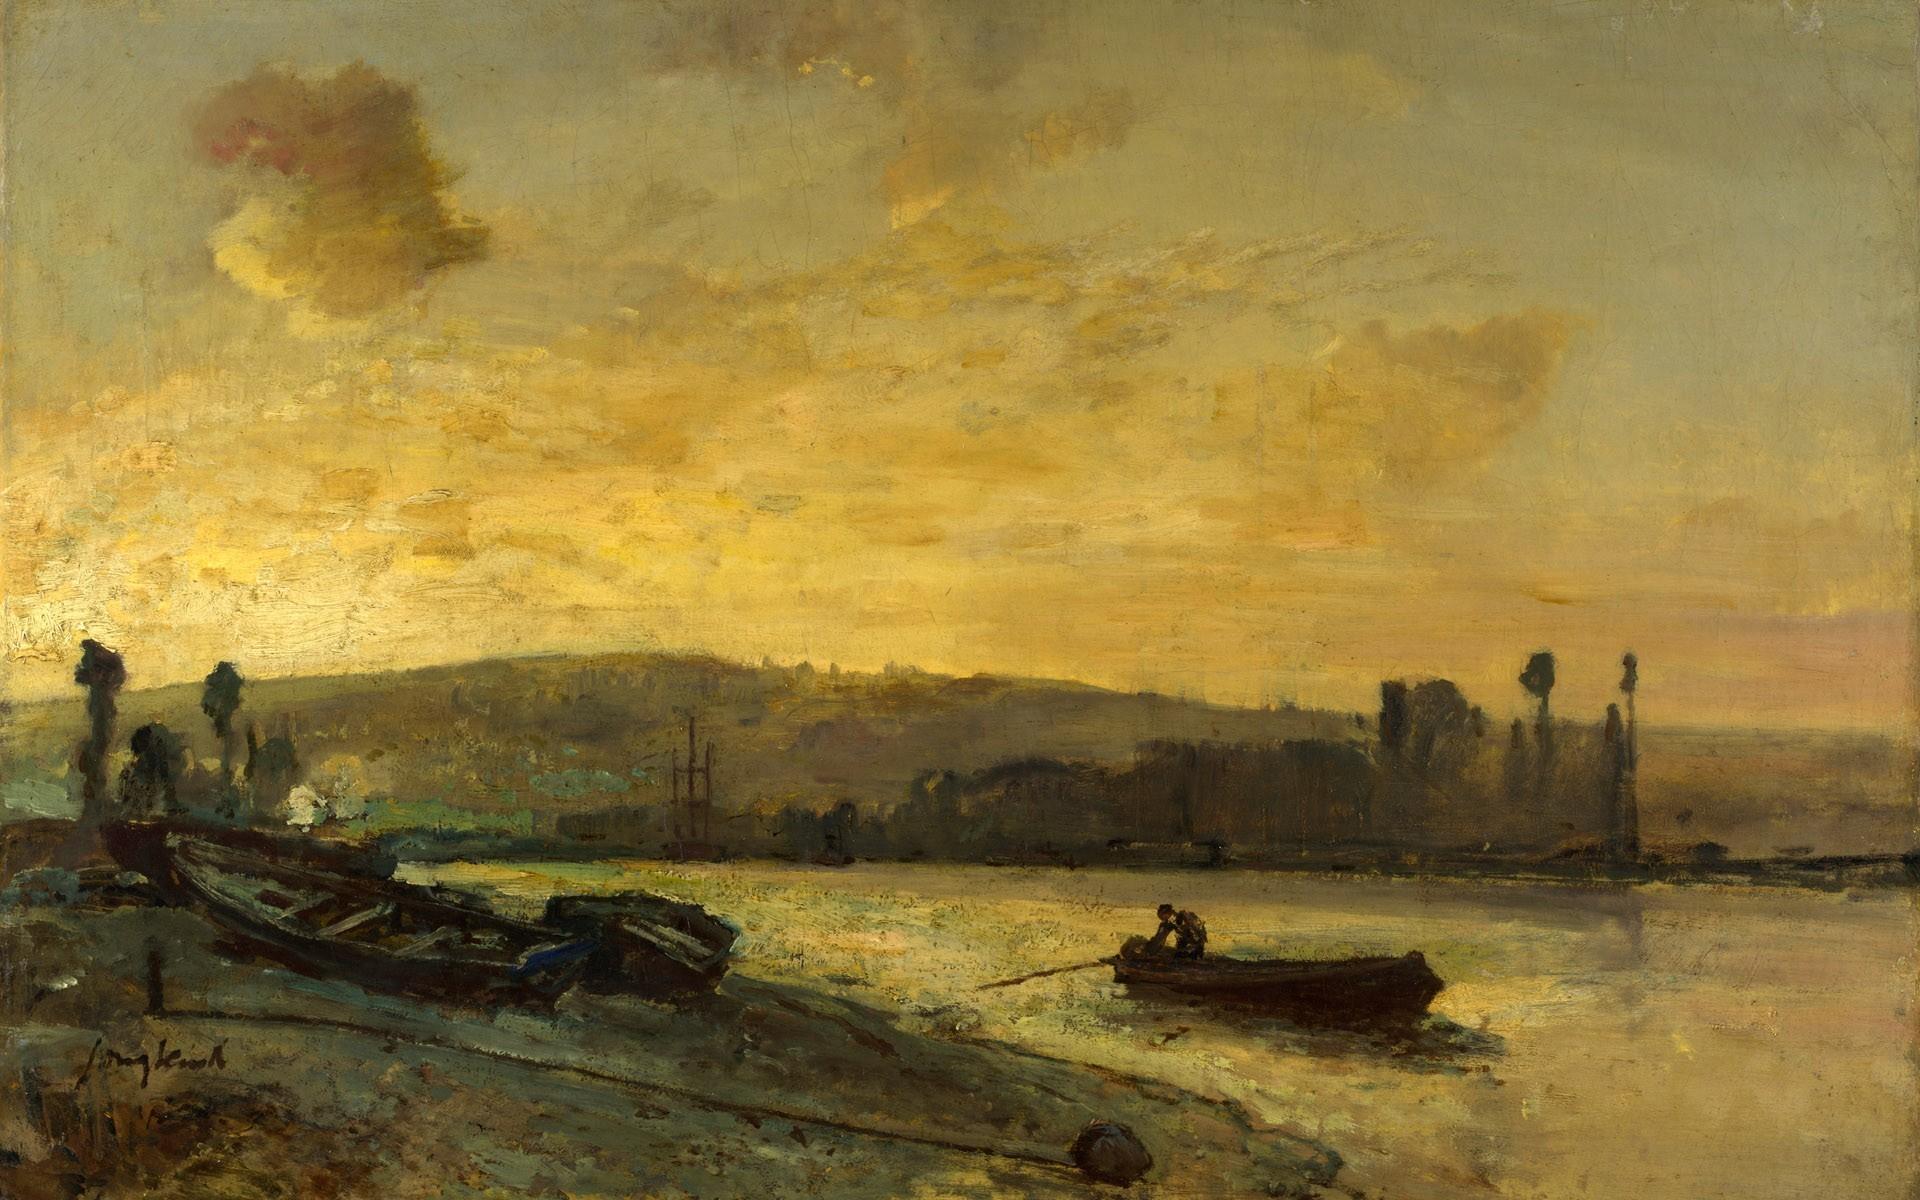 Boats paintings renaissance vehicles wallpaper 1920x1200